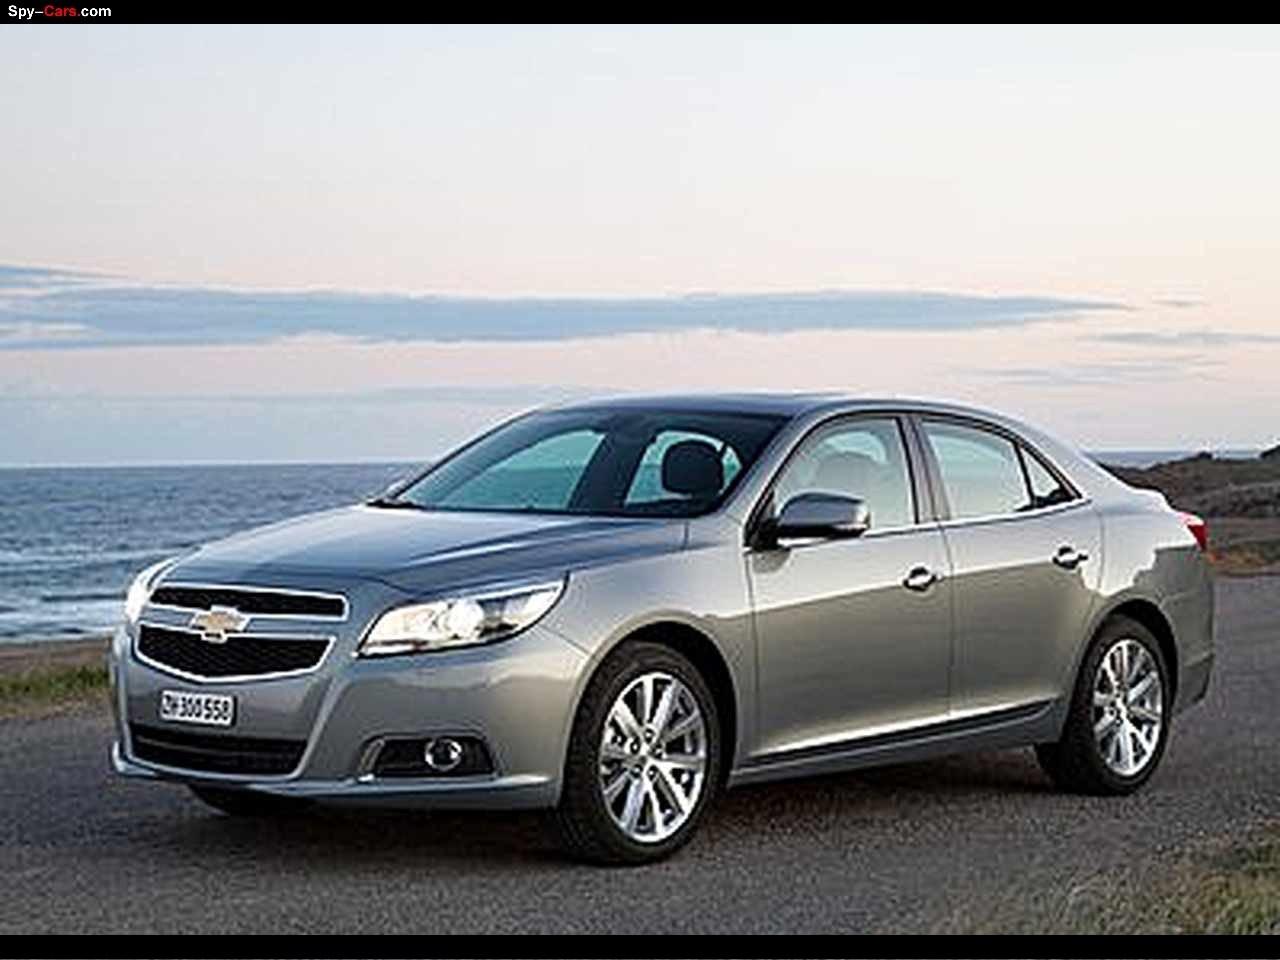 Chevrolet Autos Spain